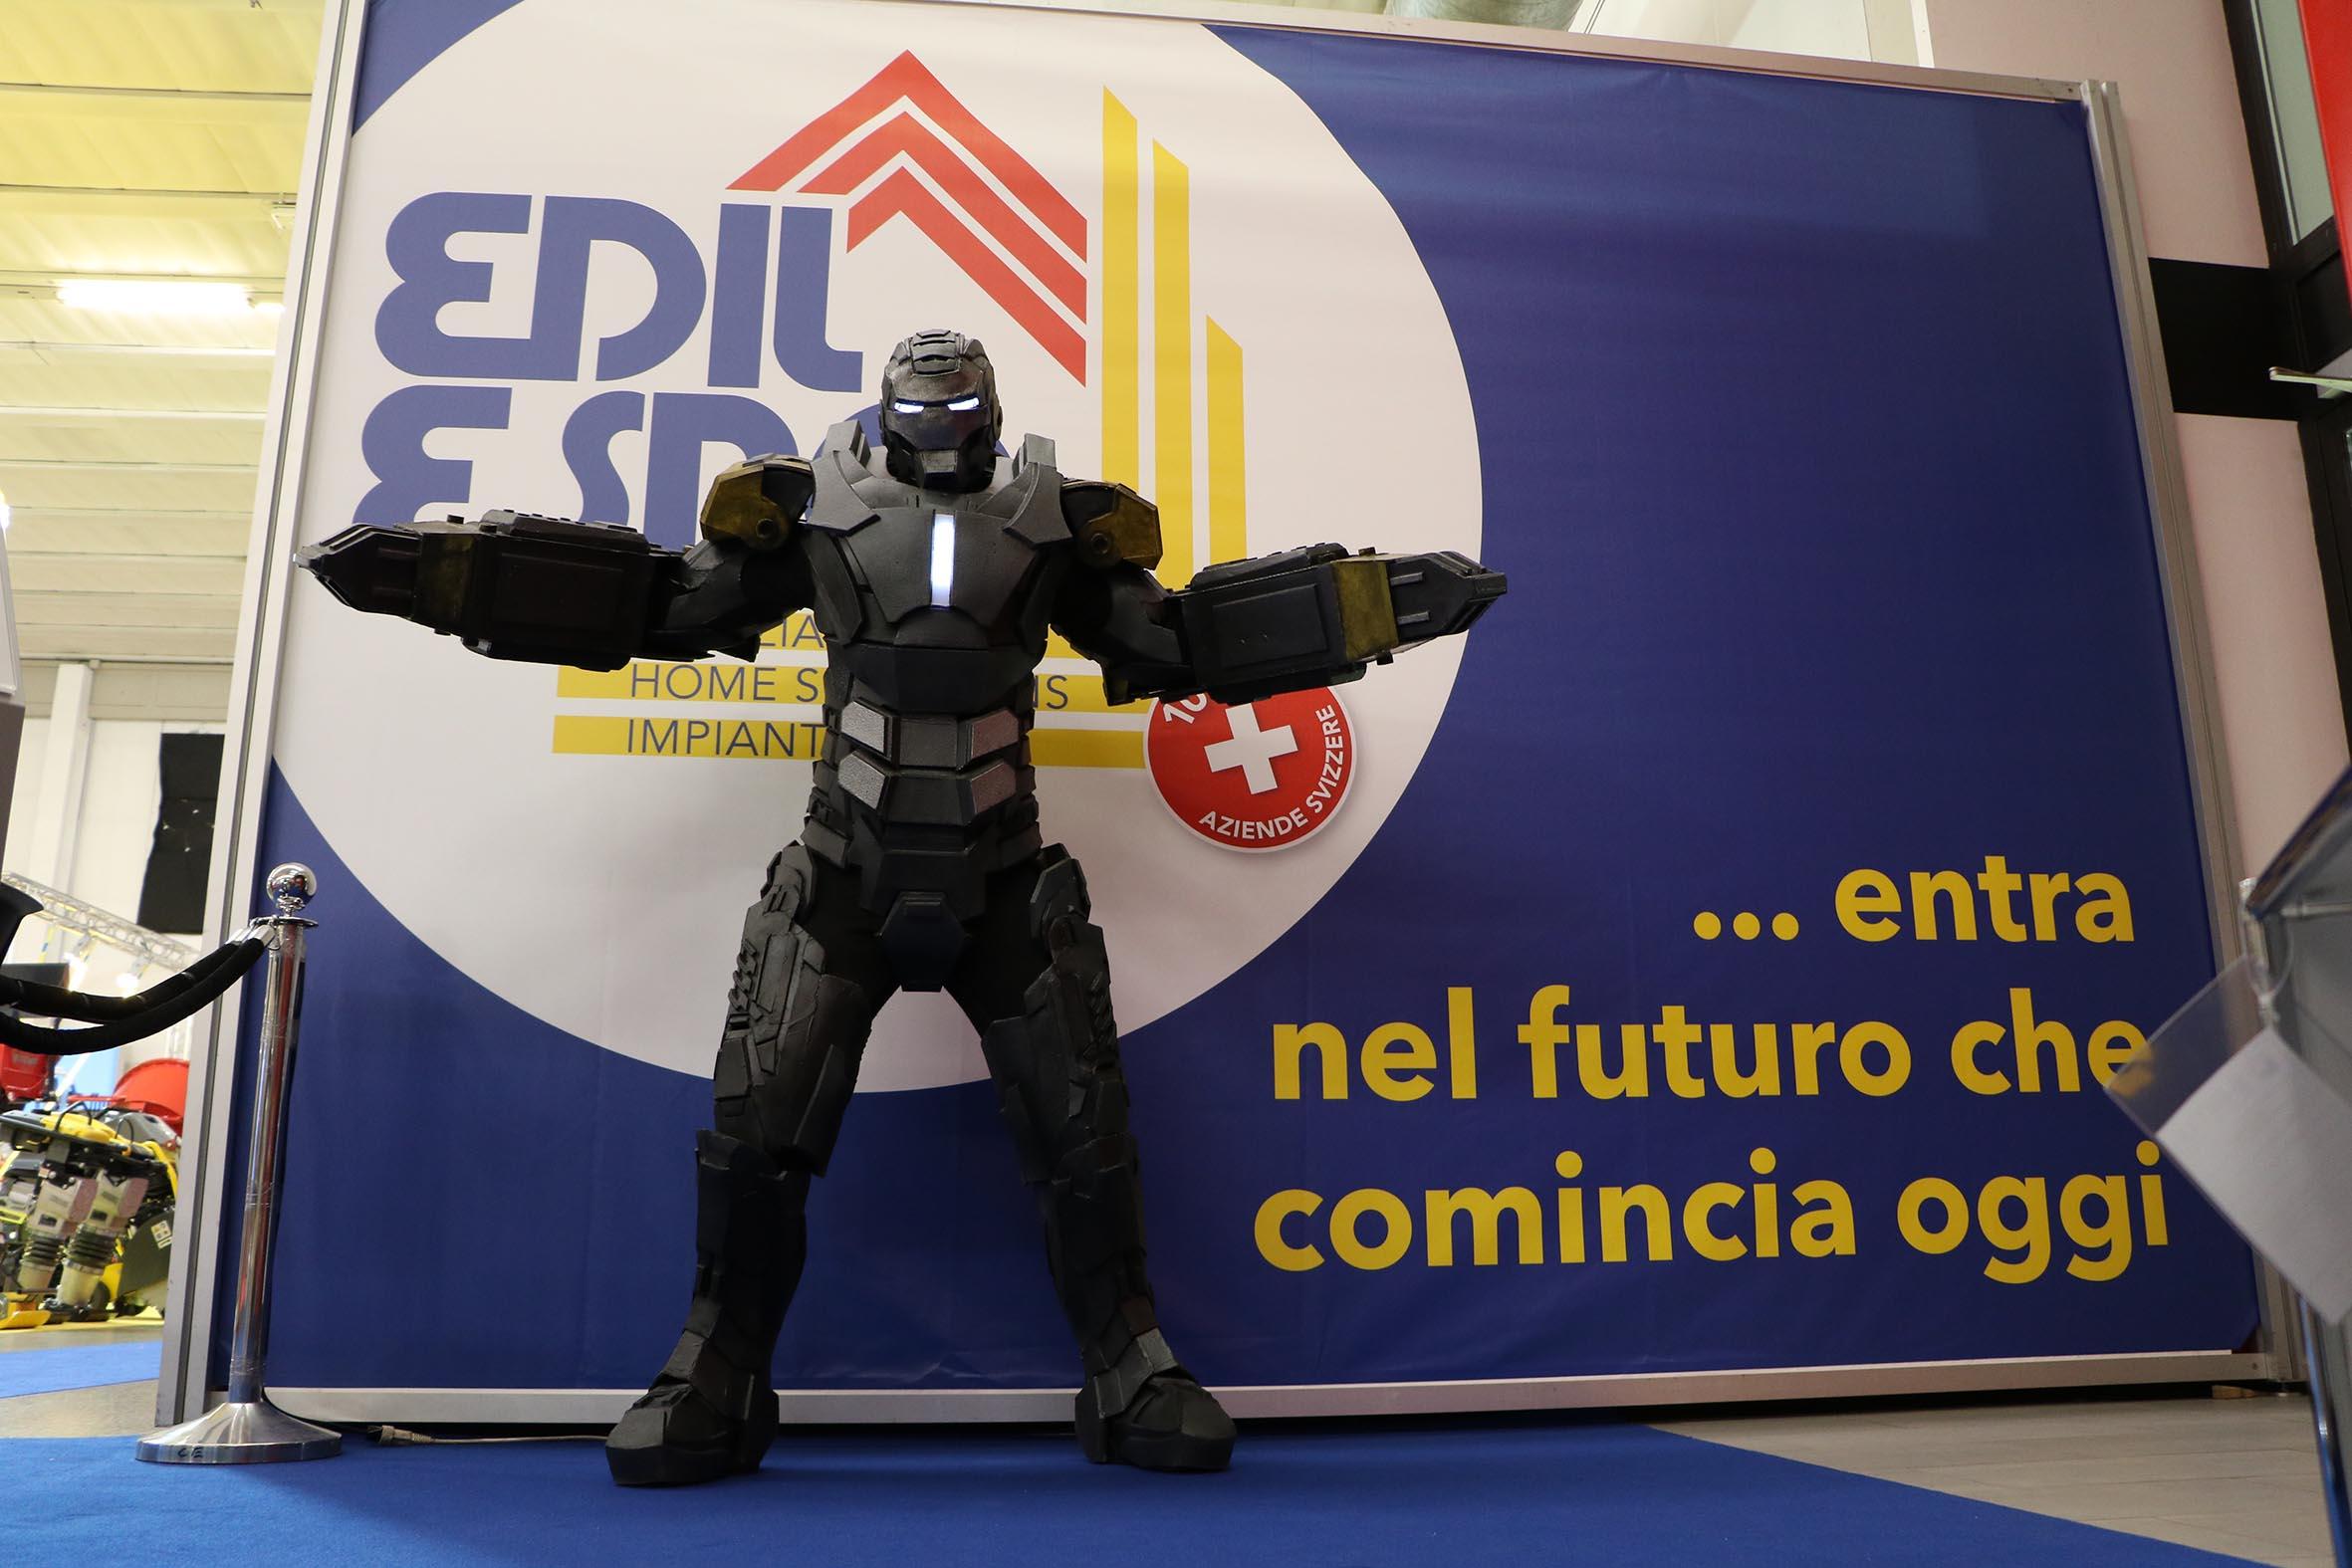 16.11-ironman 30